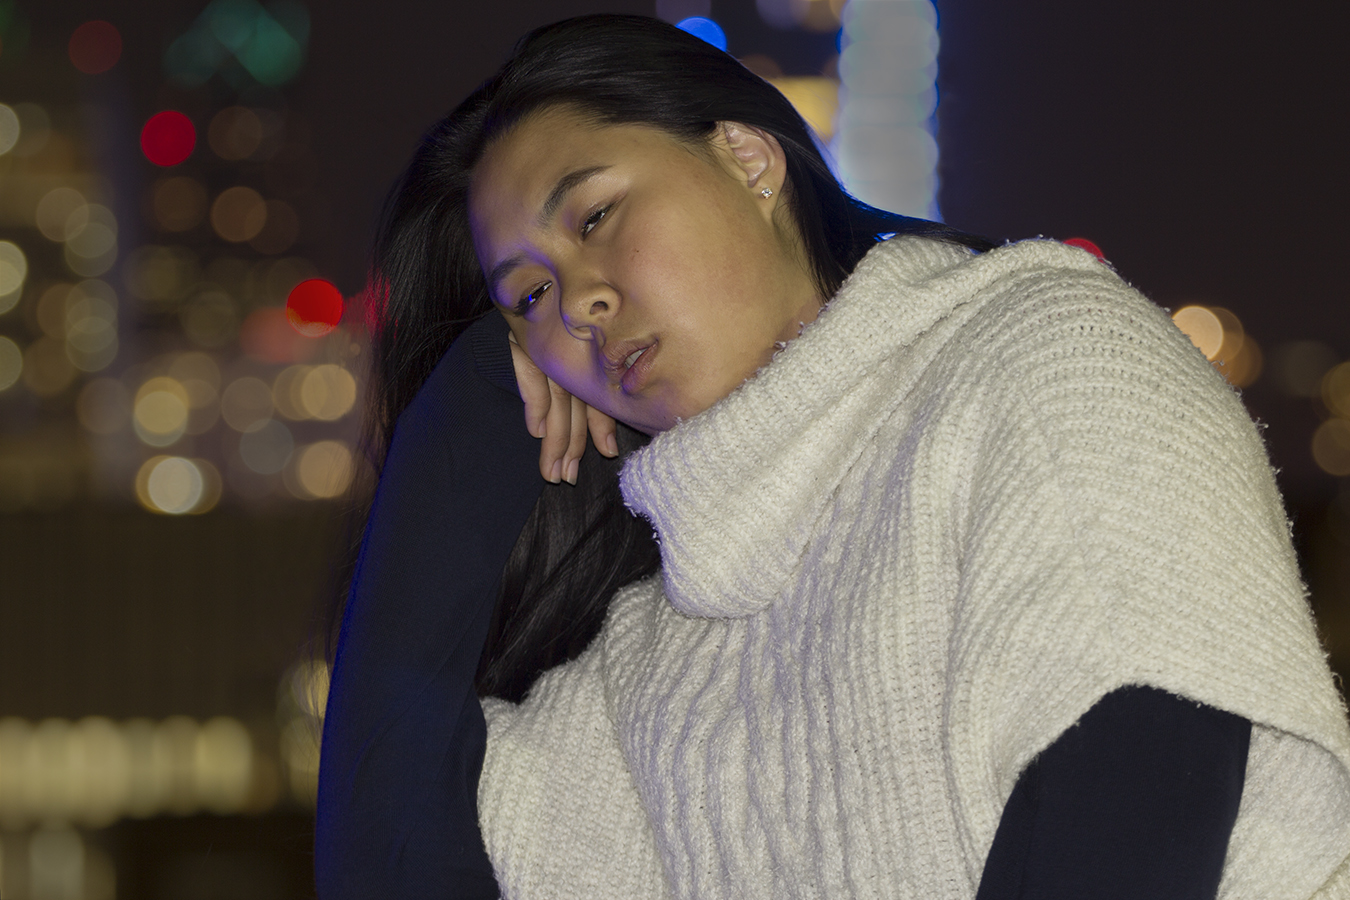 Matt_Garber_portrait_sadness_blue_light_skyline_girl_night